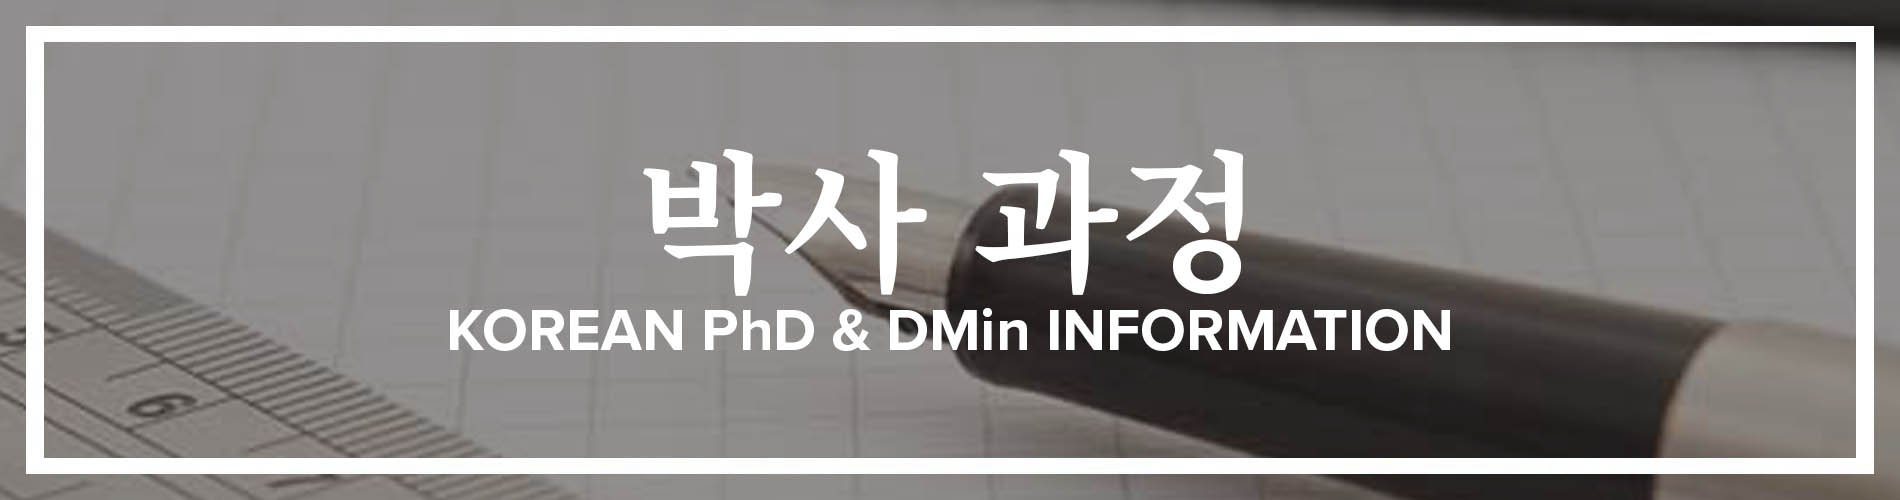 Korean PhD DMin Information Banner